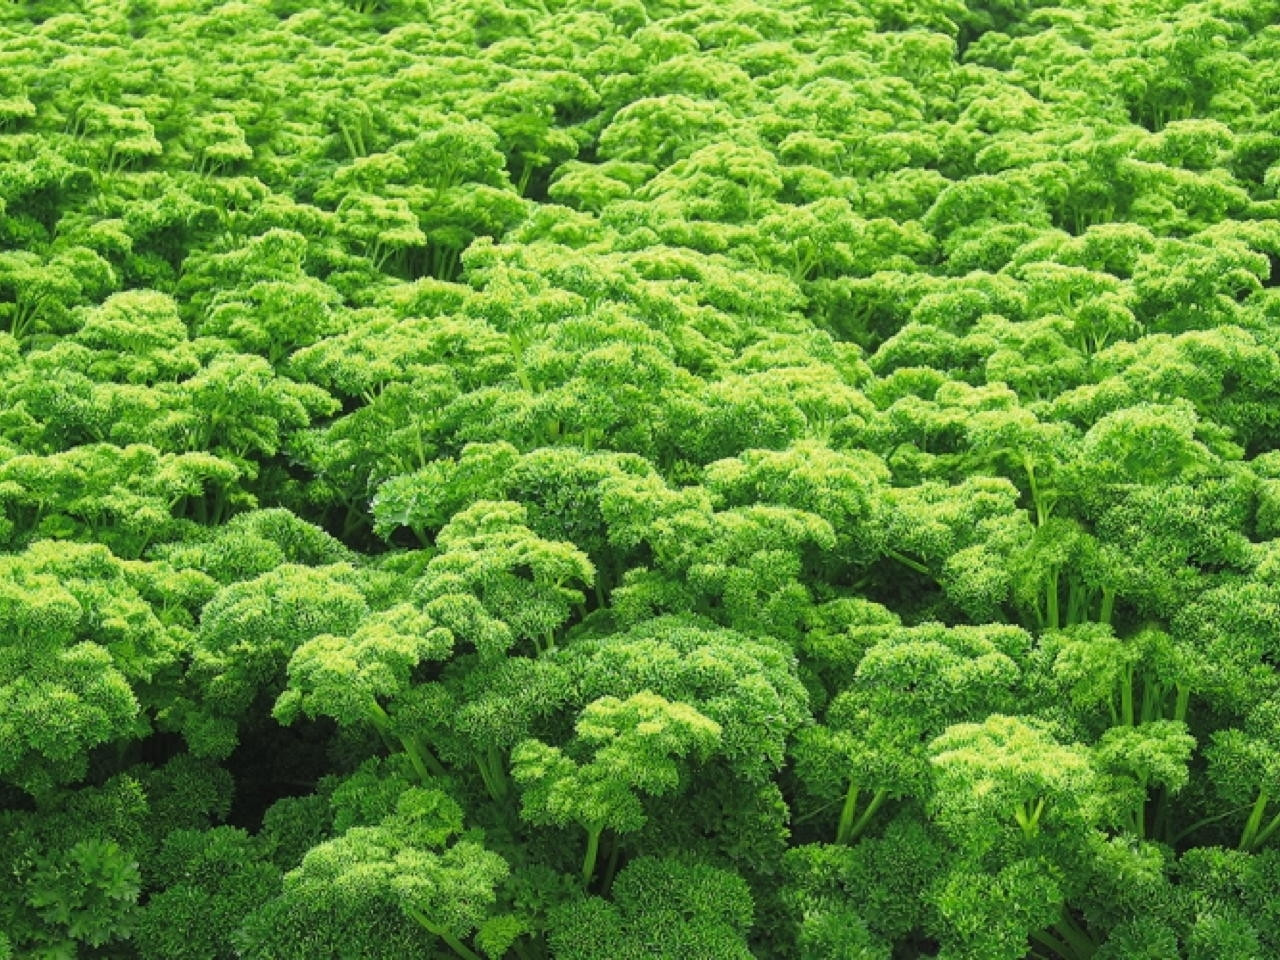 Prezzemolo Moss Curled 2 - Plantgest.com